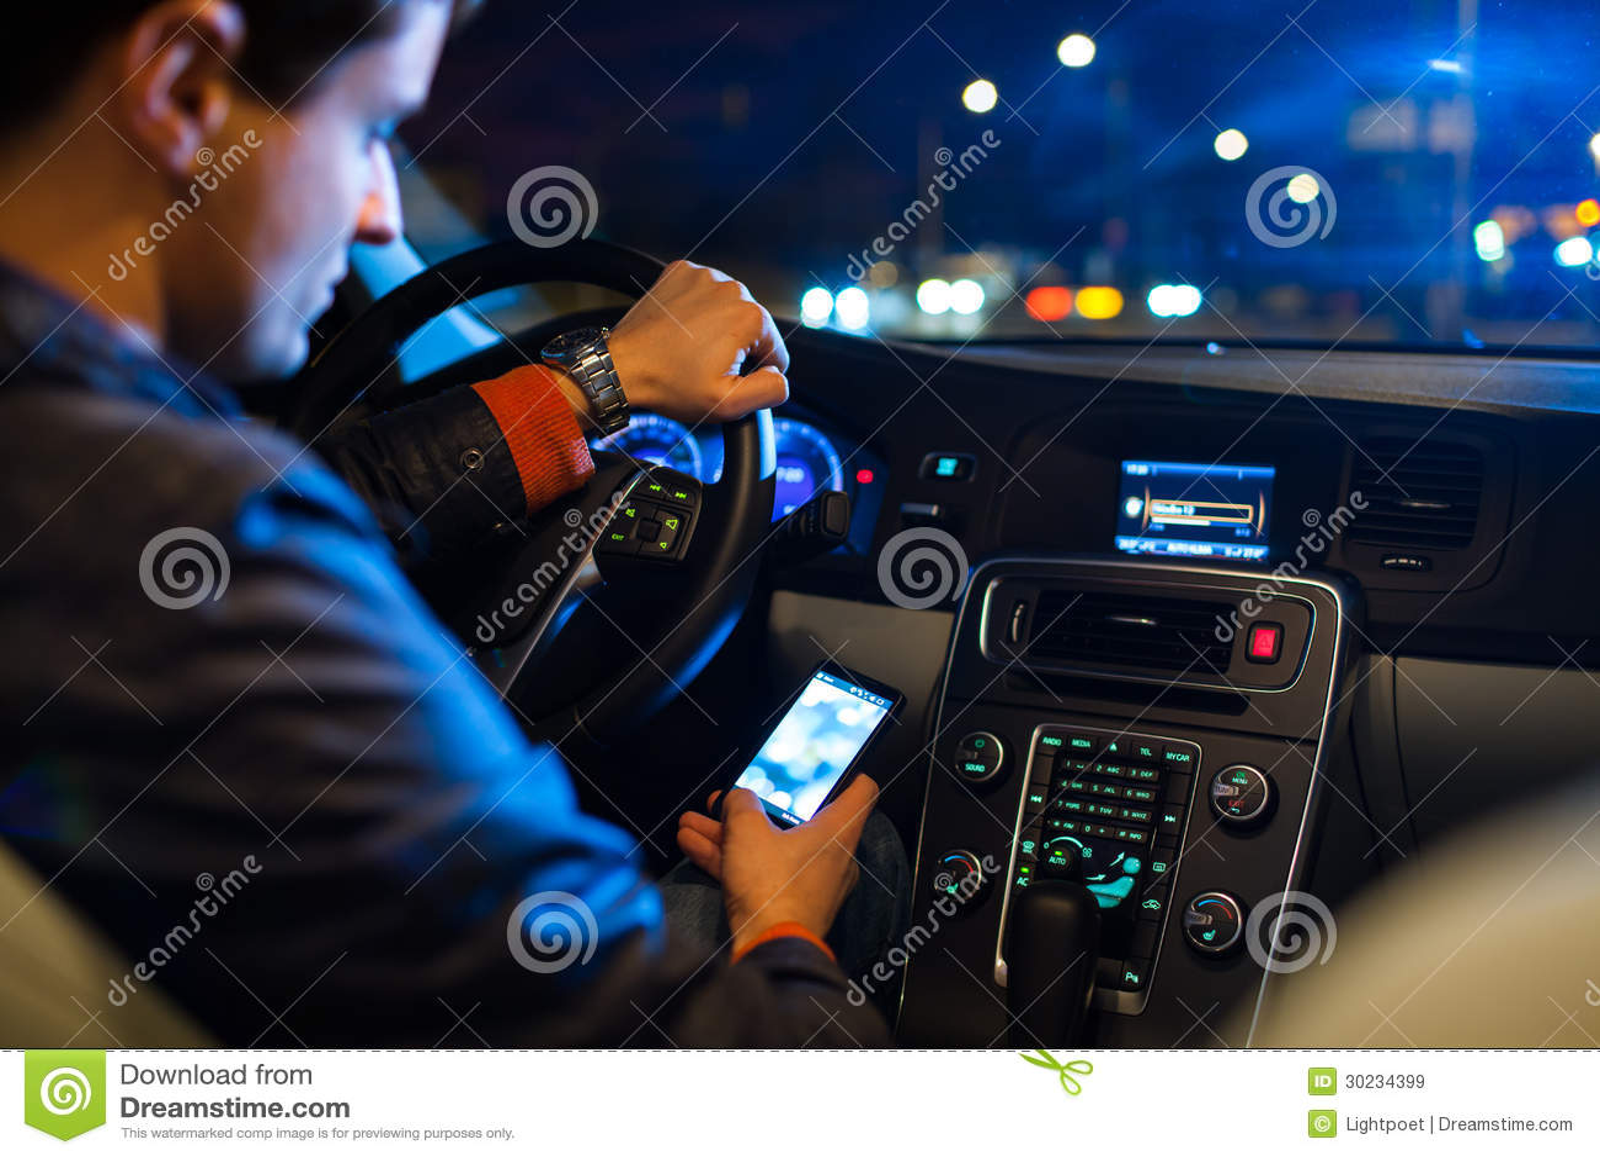 Driving A Car At Night Royalty Free Stock Images Image